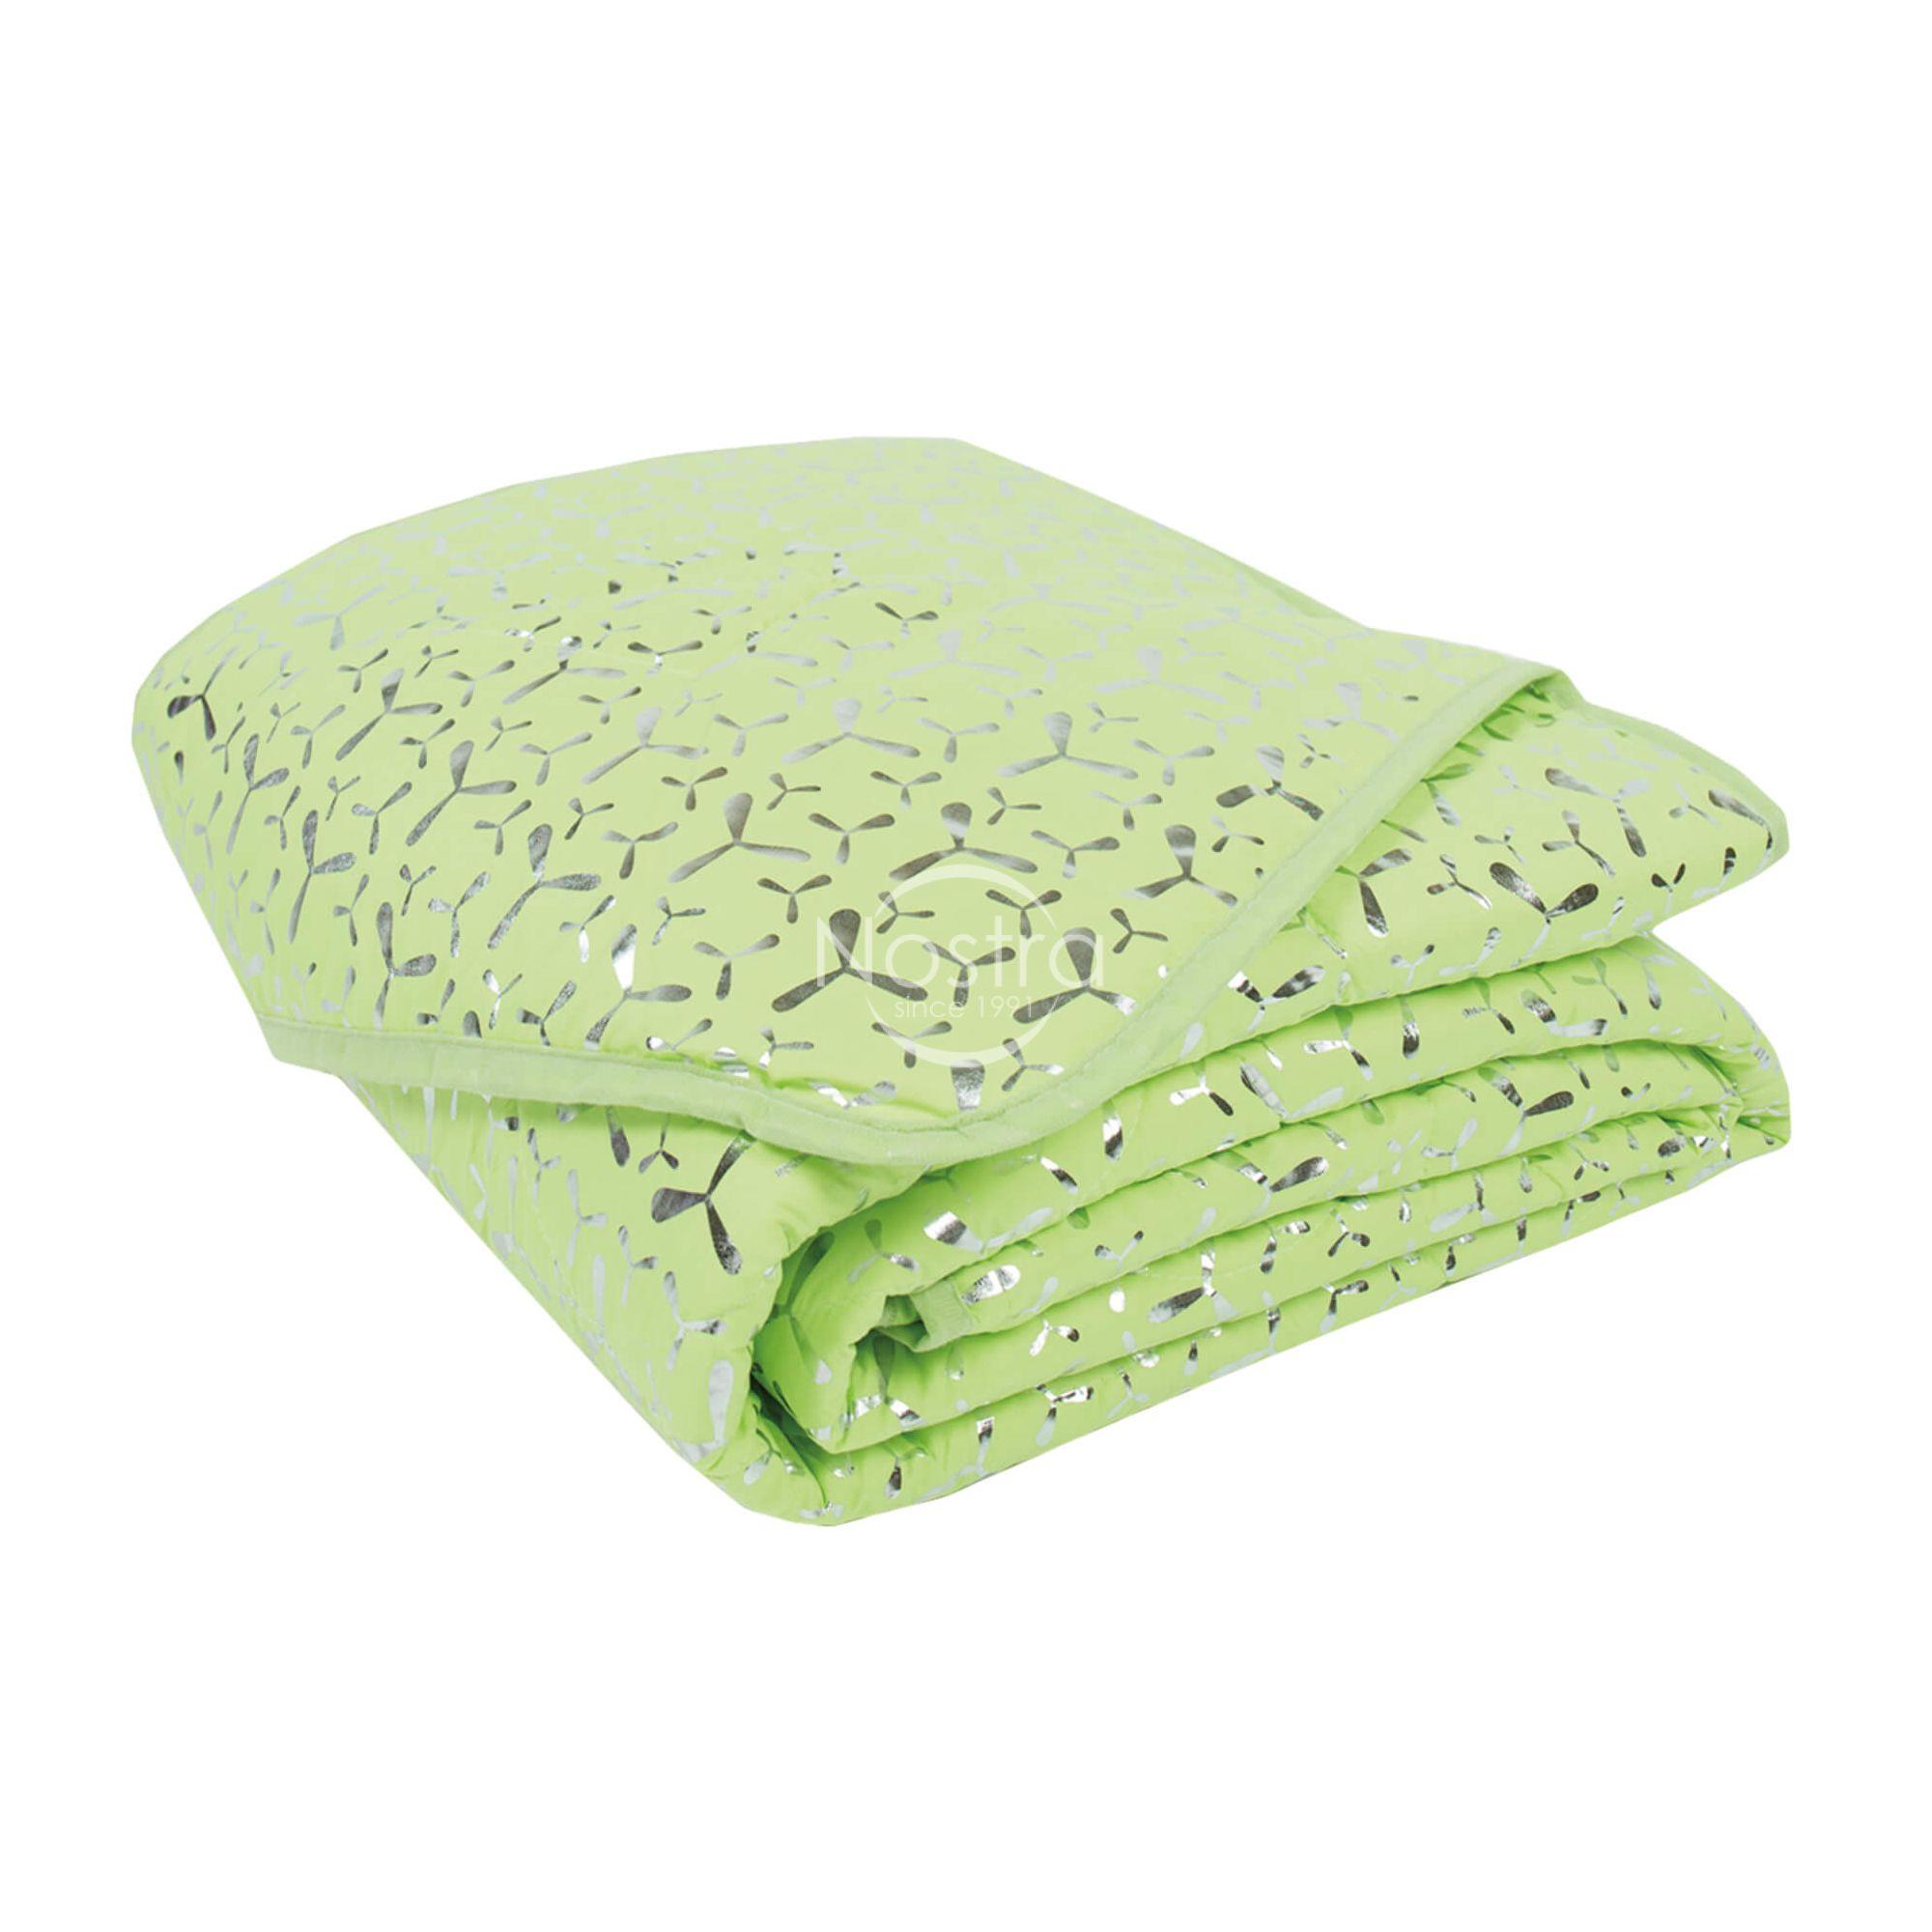 Marginta lovatiesė, lovos užtiesalas METALIC 70-0024-SOFT GREEN/SILVER